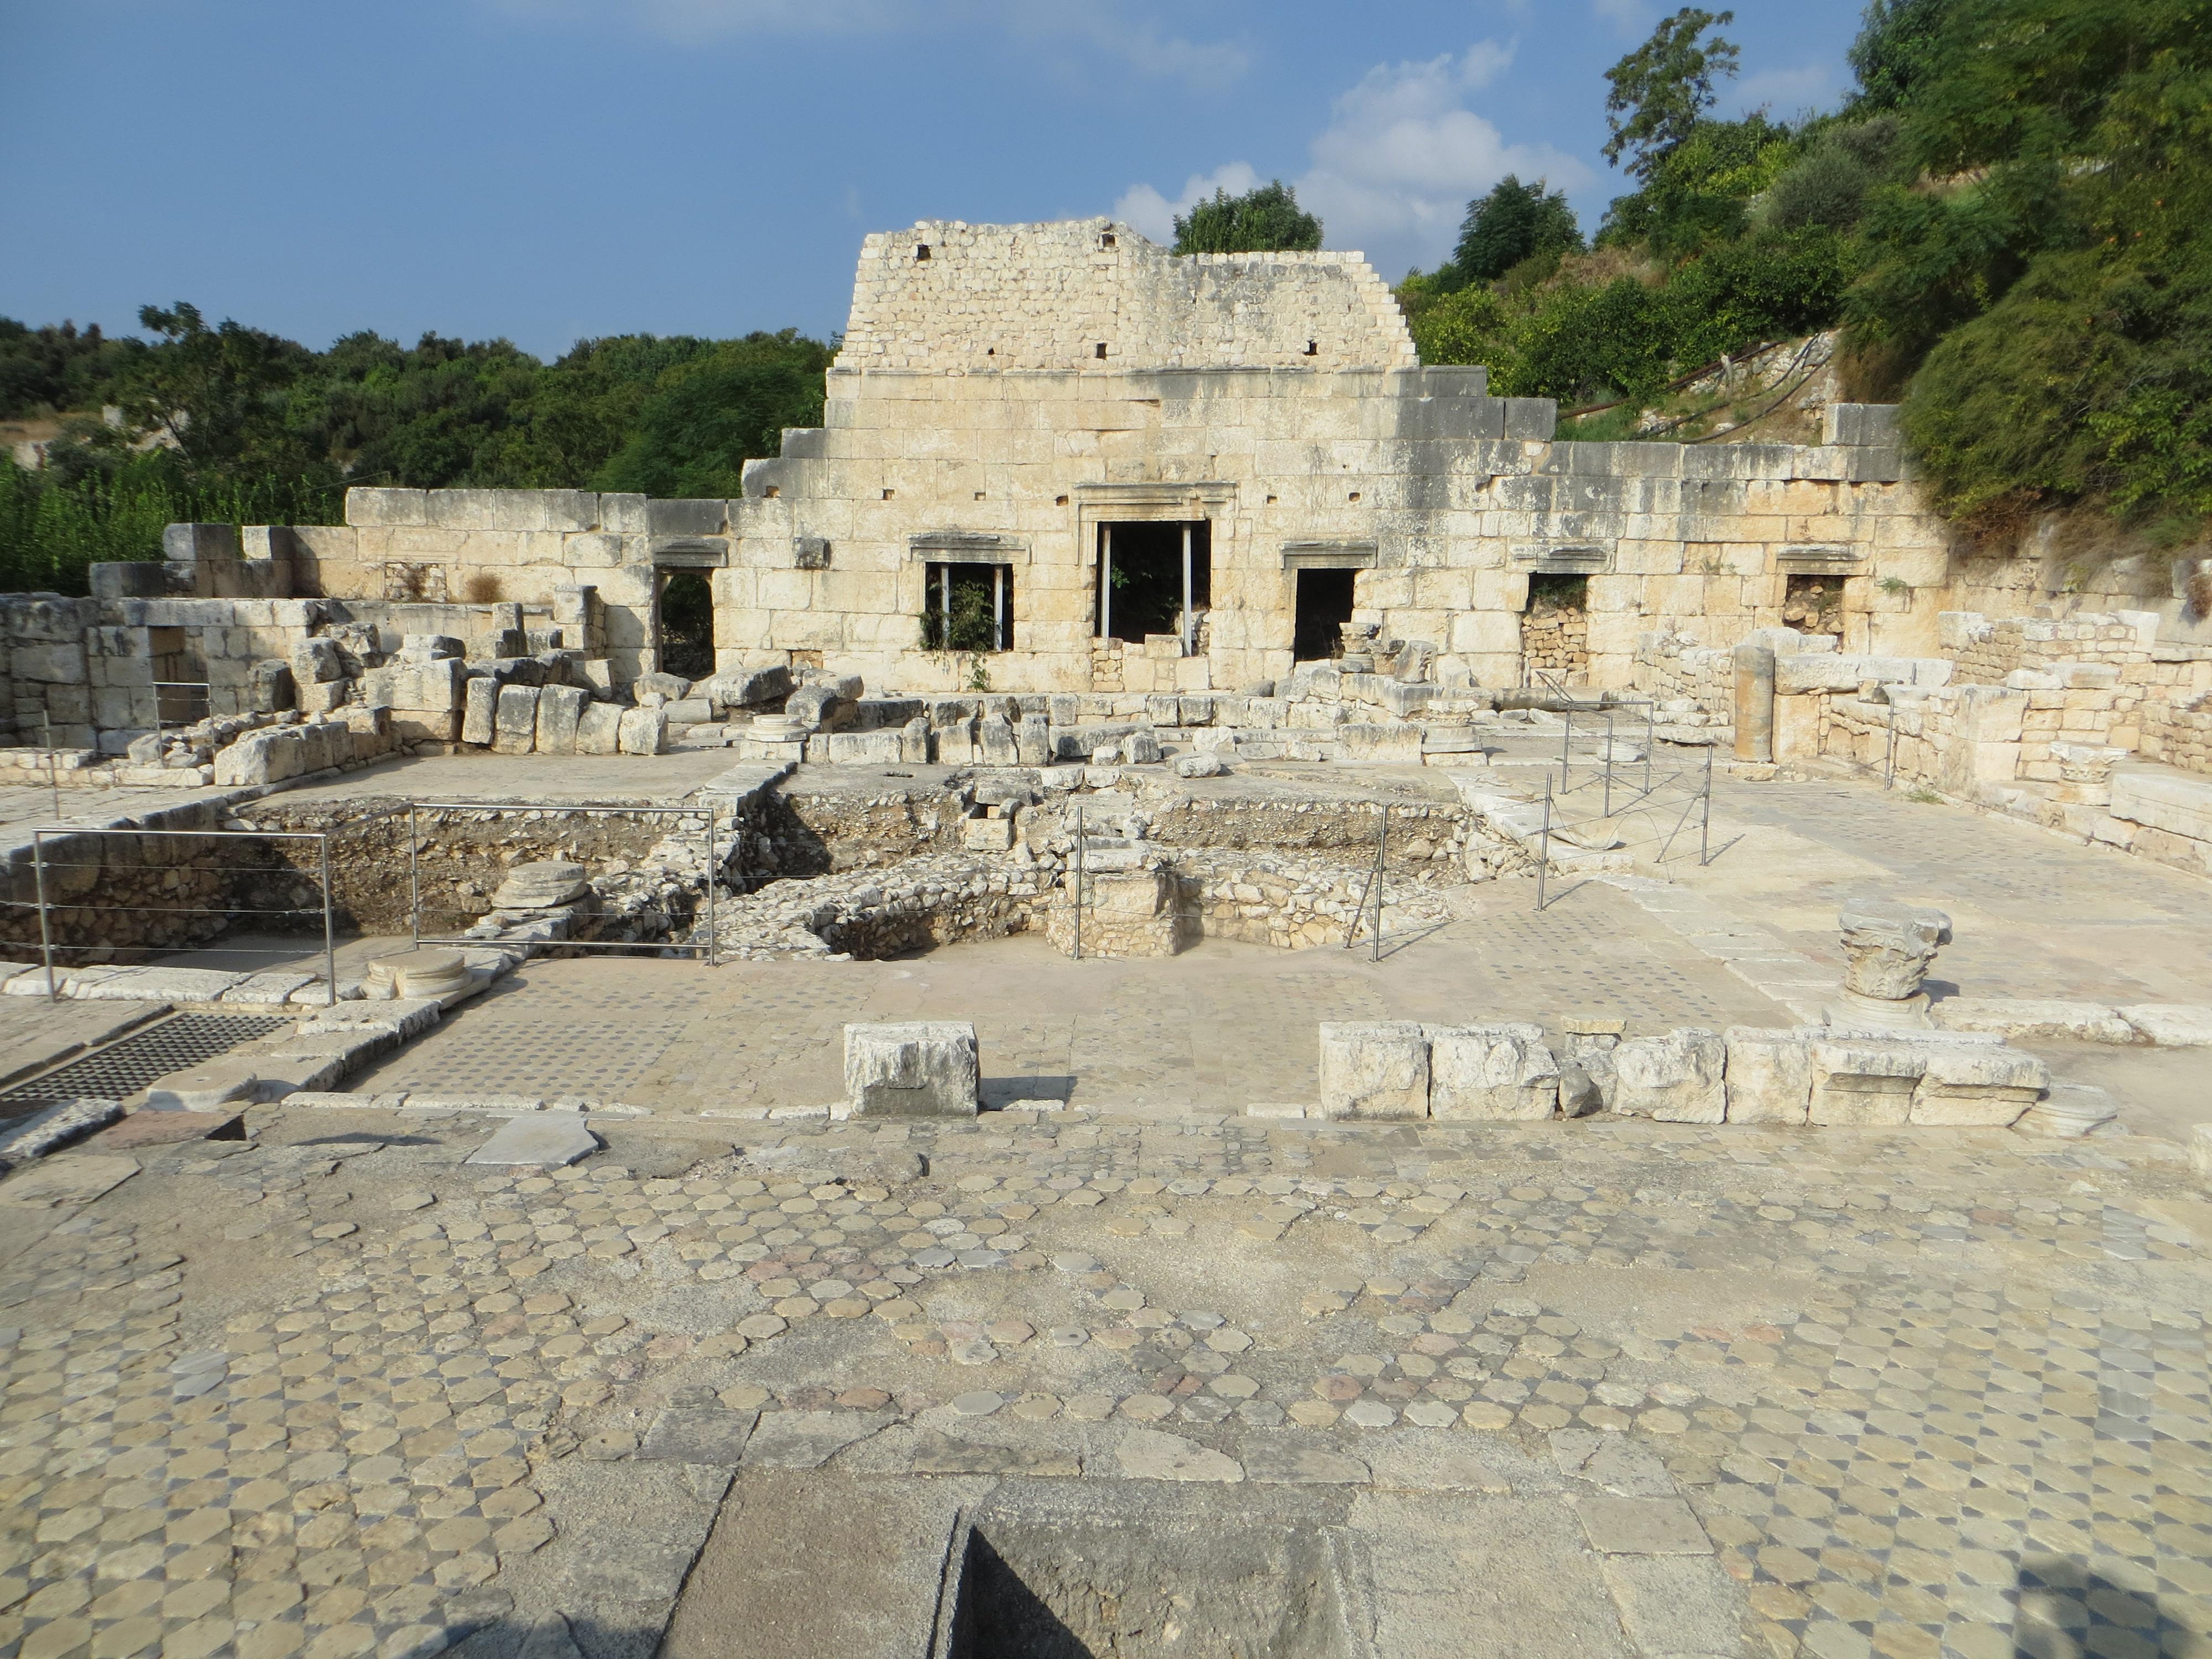 Agora-Kirche in Elaioussa Sebaste, heute Türkei